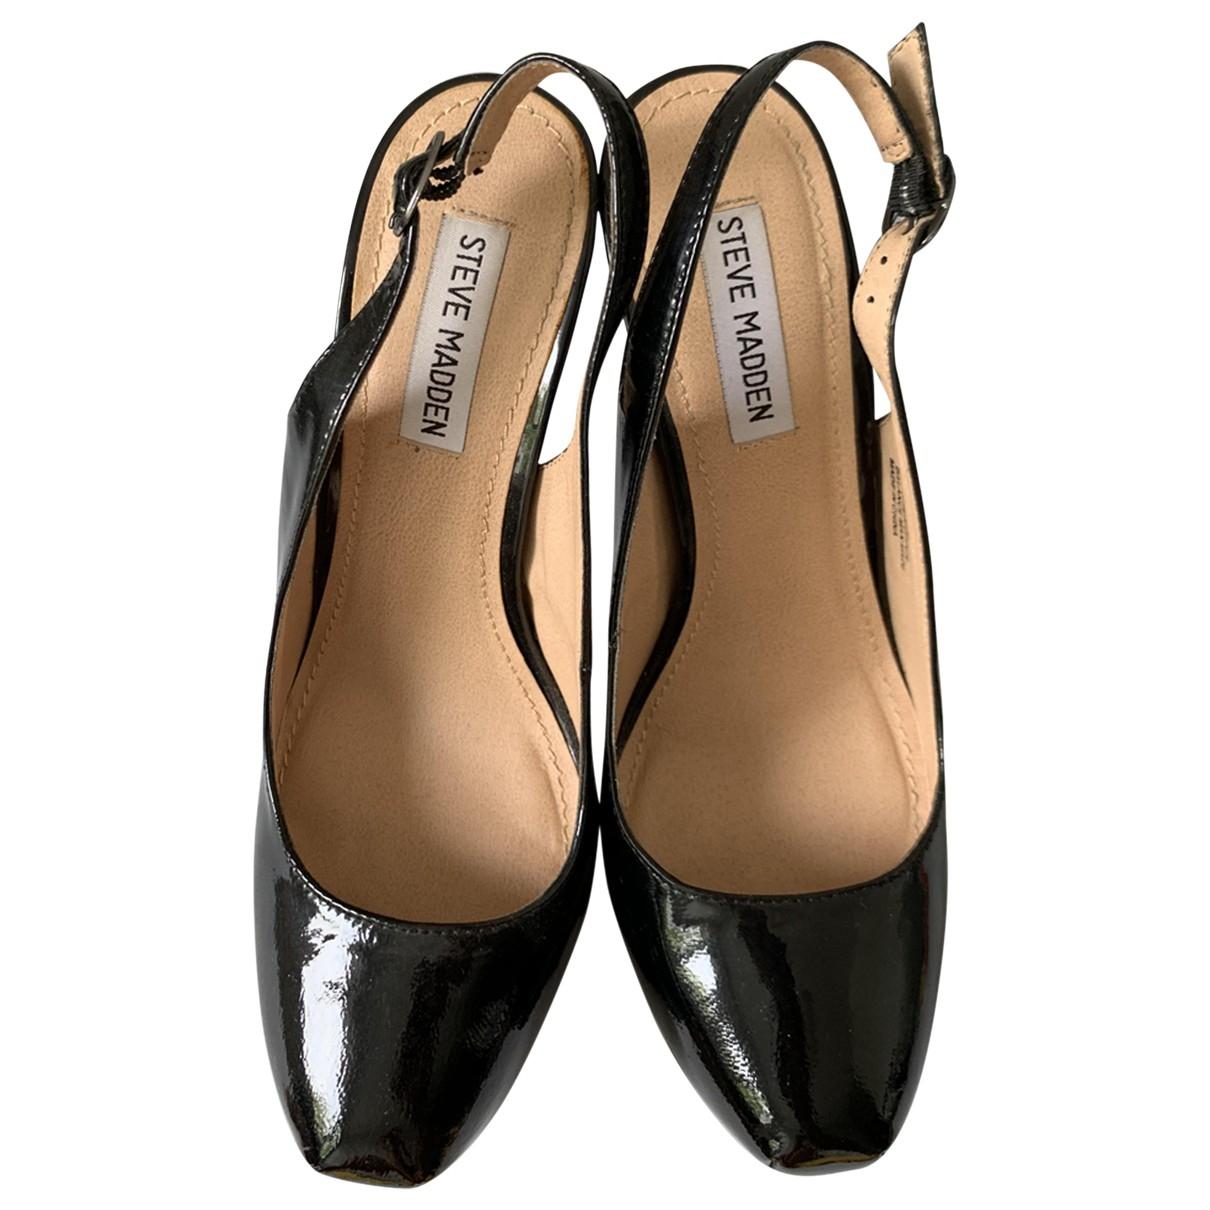 Steve Madden \N Black Patent leather Heels for Women 9.5 US